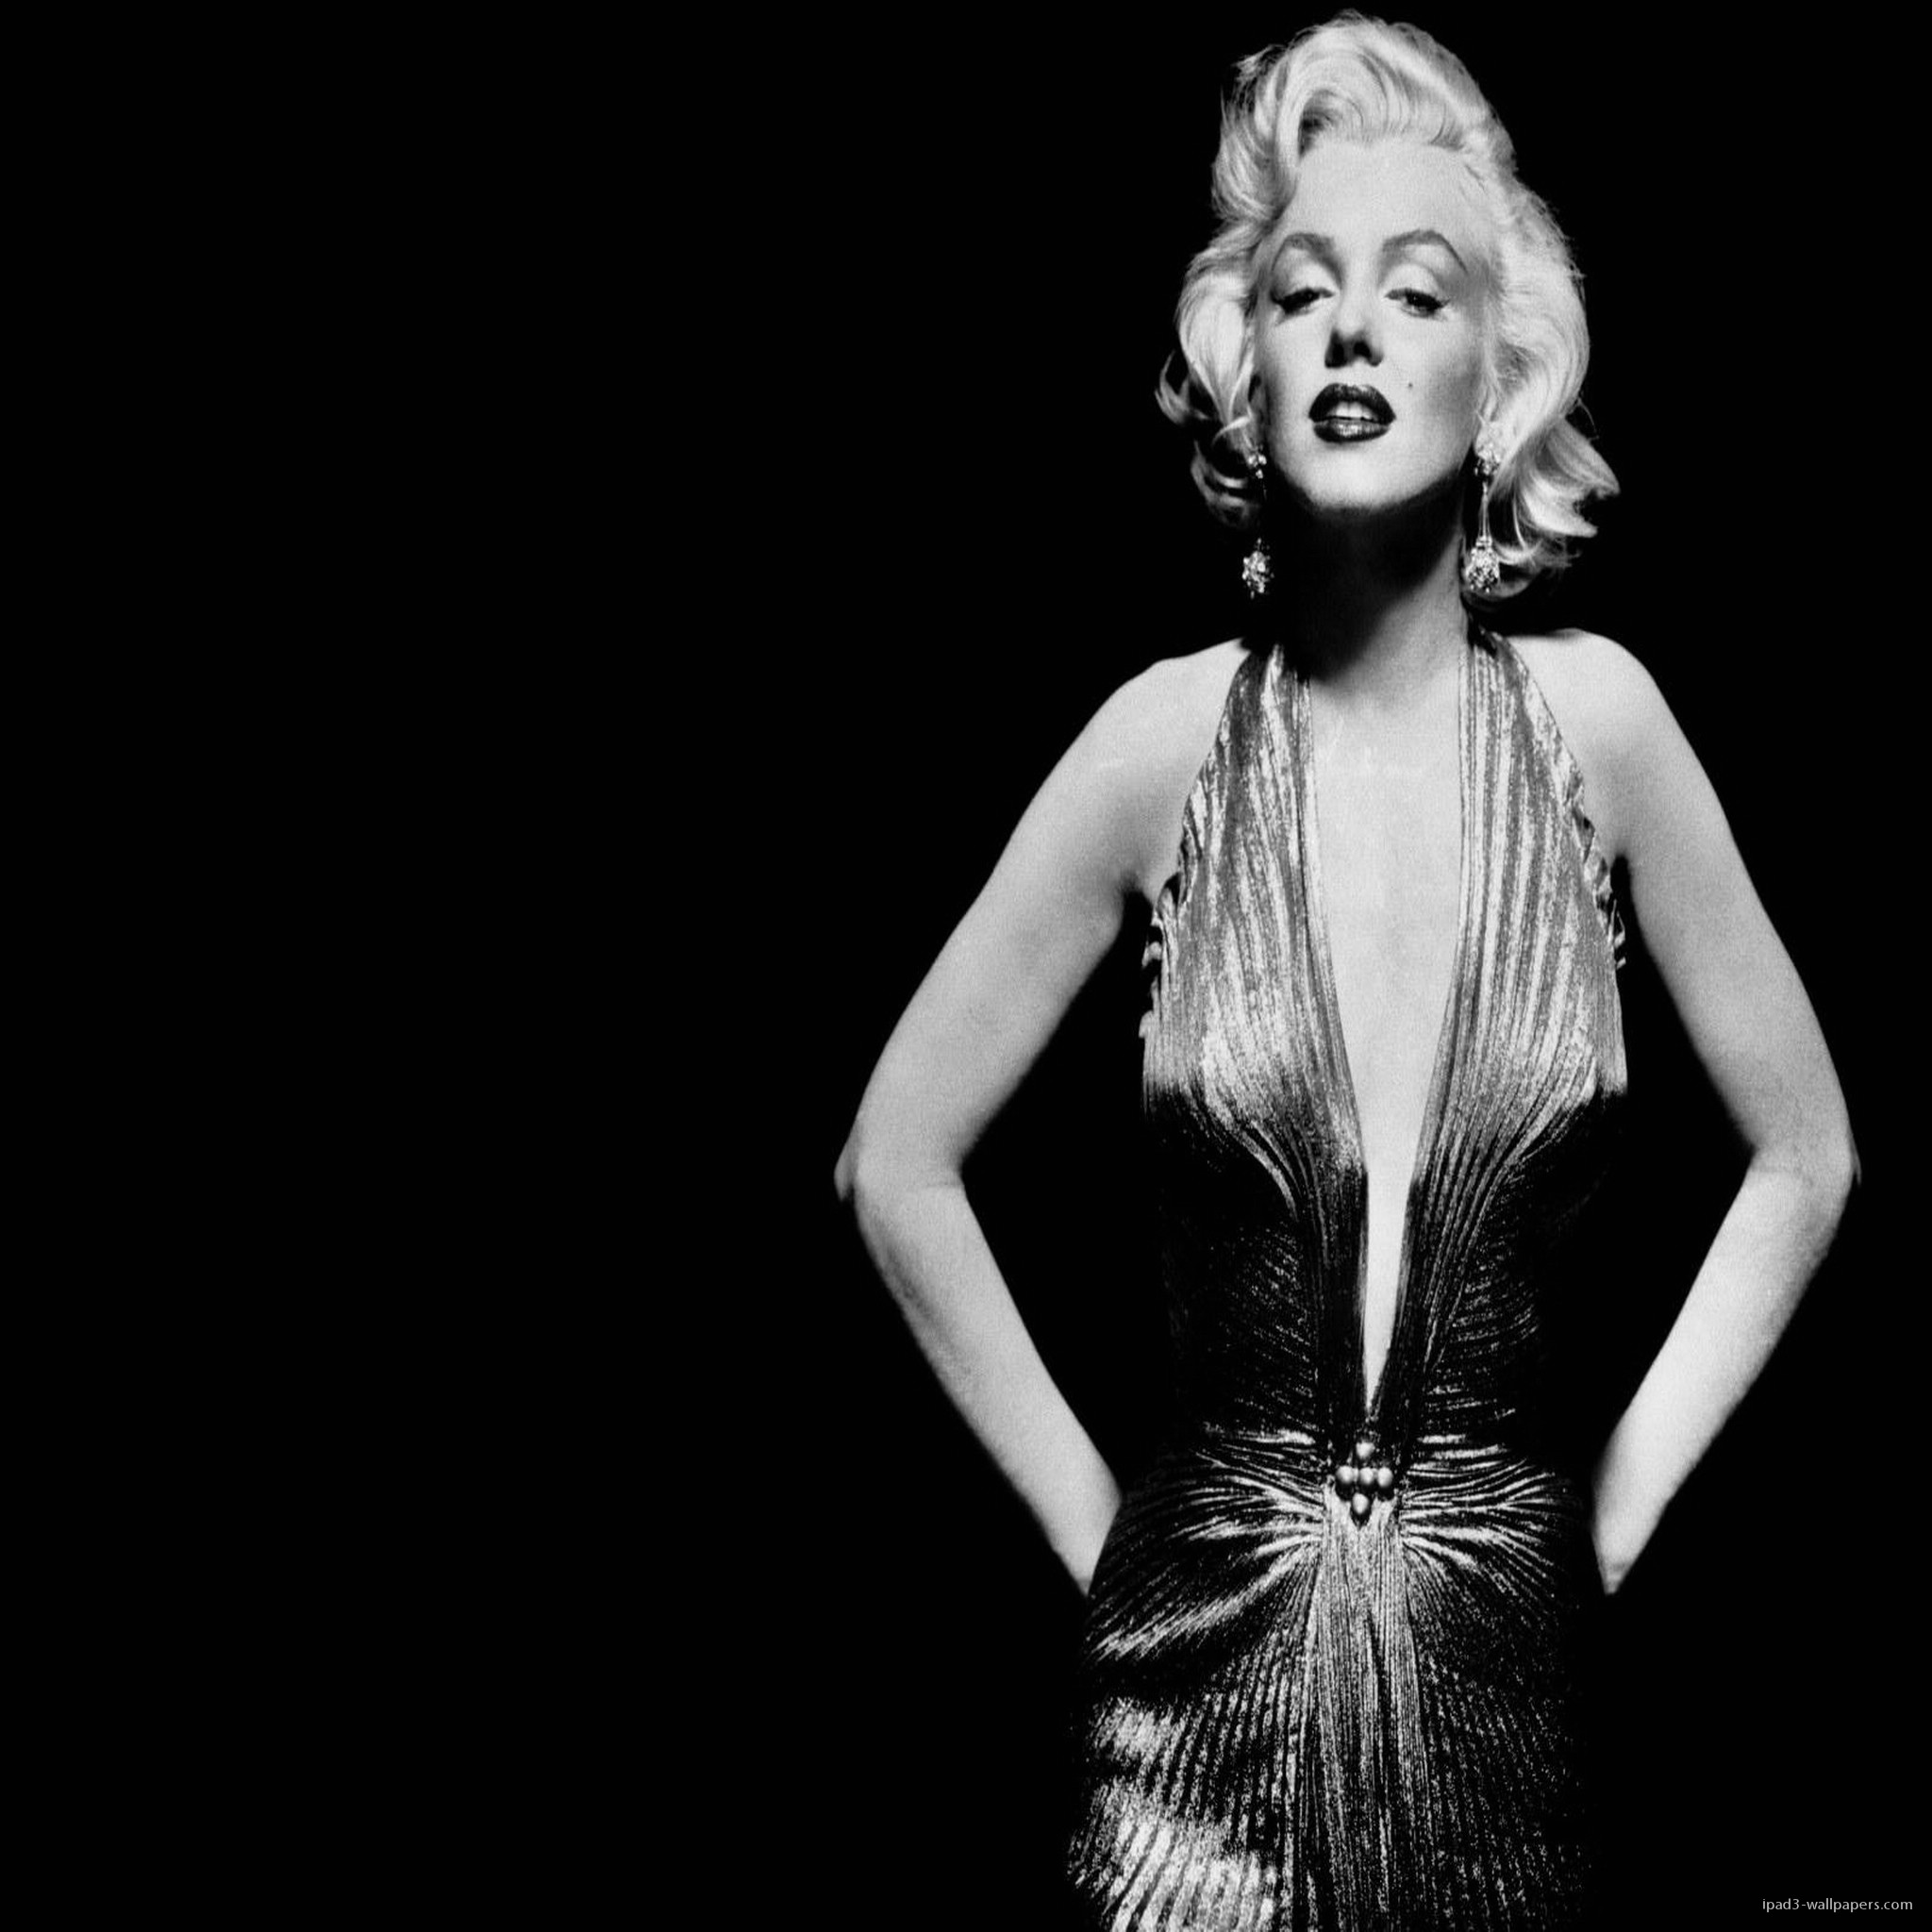 Marilyn monroe hd wallpaper wallpapersafari - Marilyn monroe wallpaper download ...